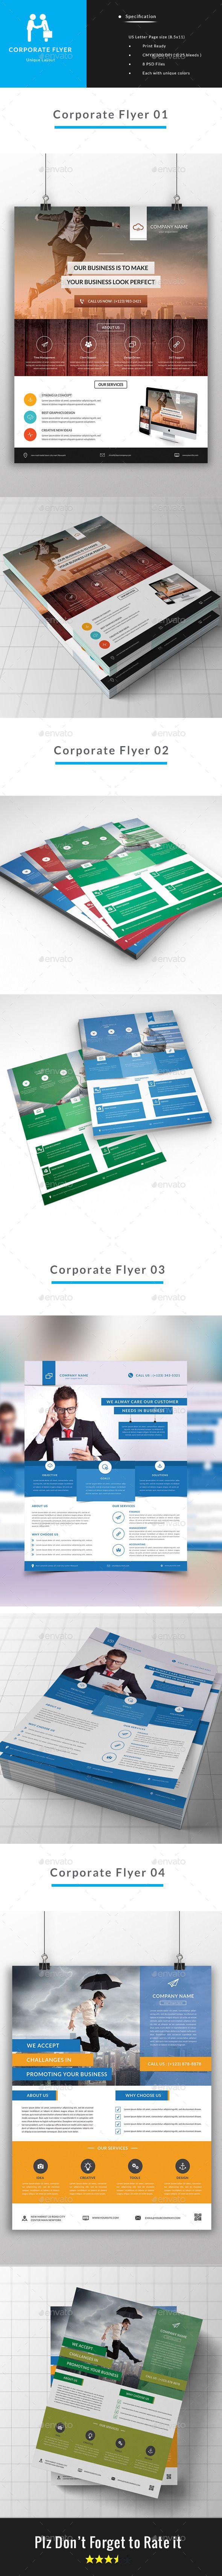 Corporate Business Flyer Bundle ( 4 in 1 )